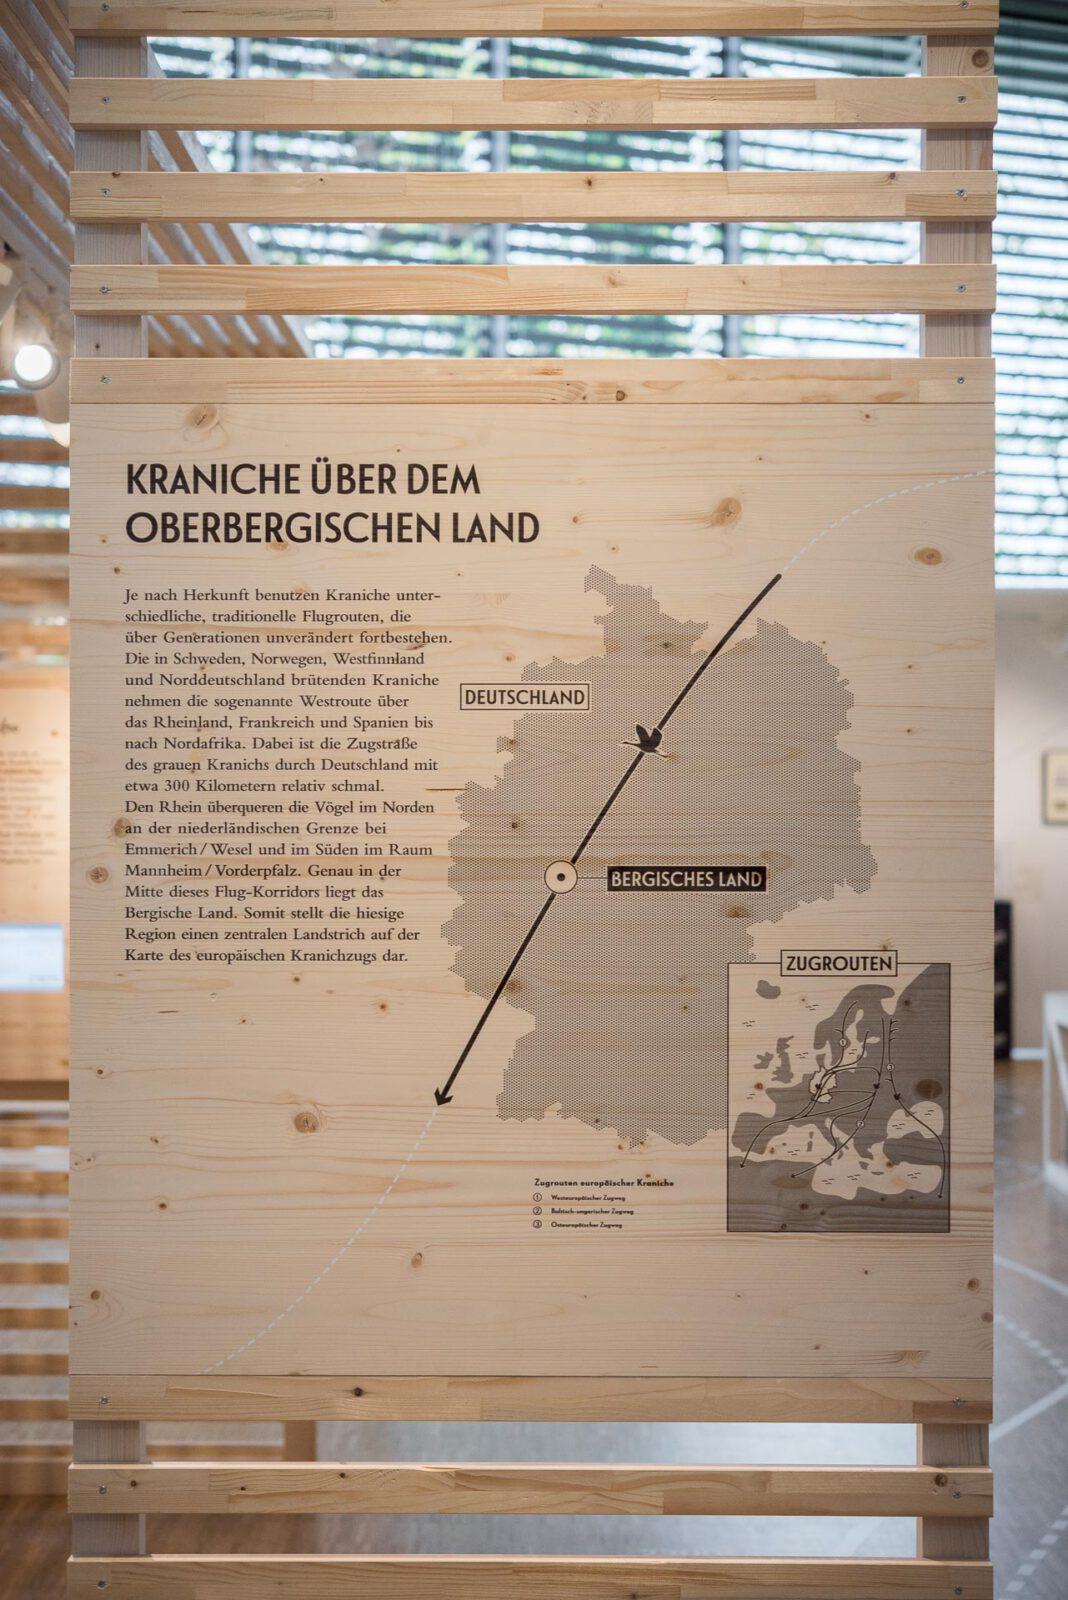 3_M_Kraniche_Schloss-Homburg_BOKG_02-11-2018_MFN1877